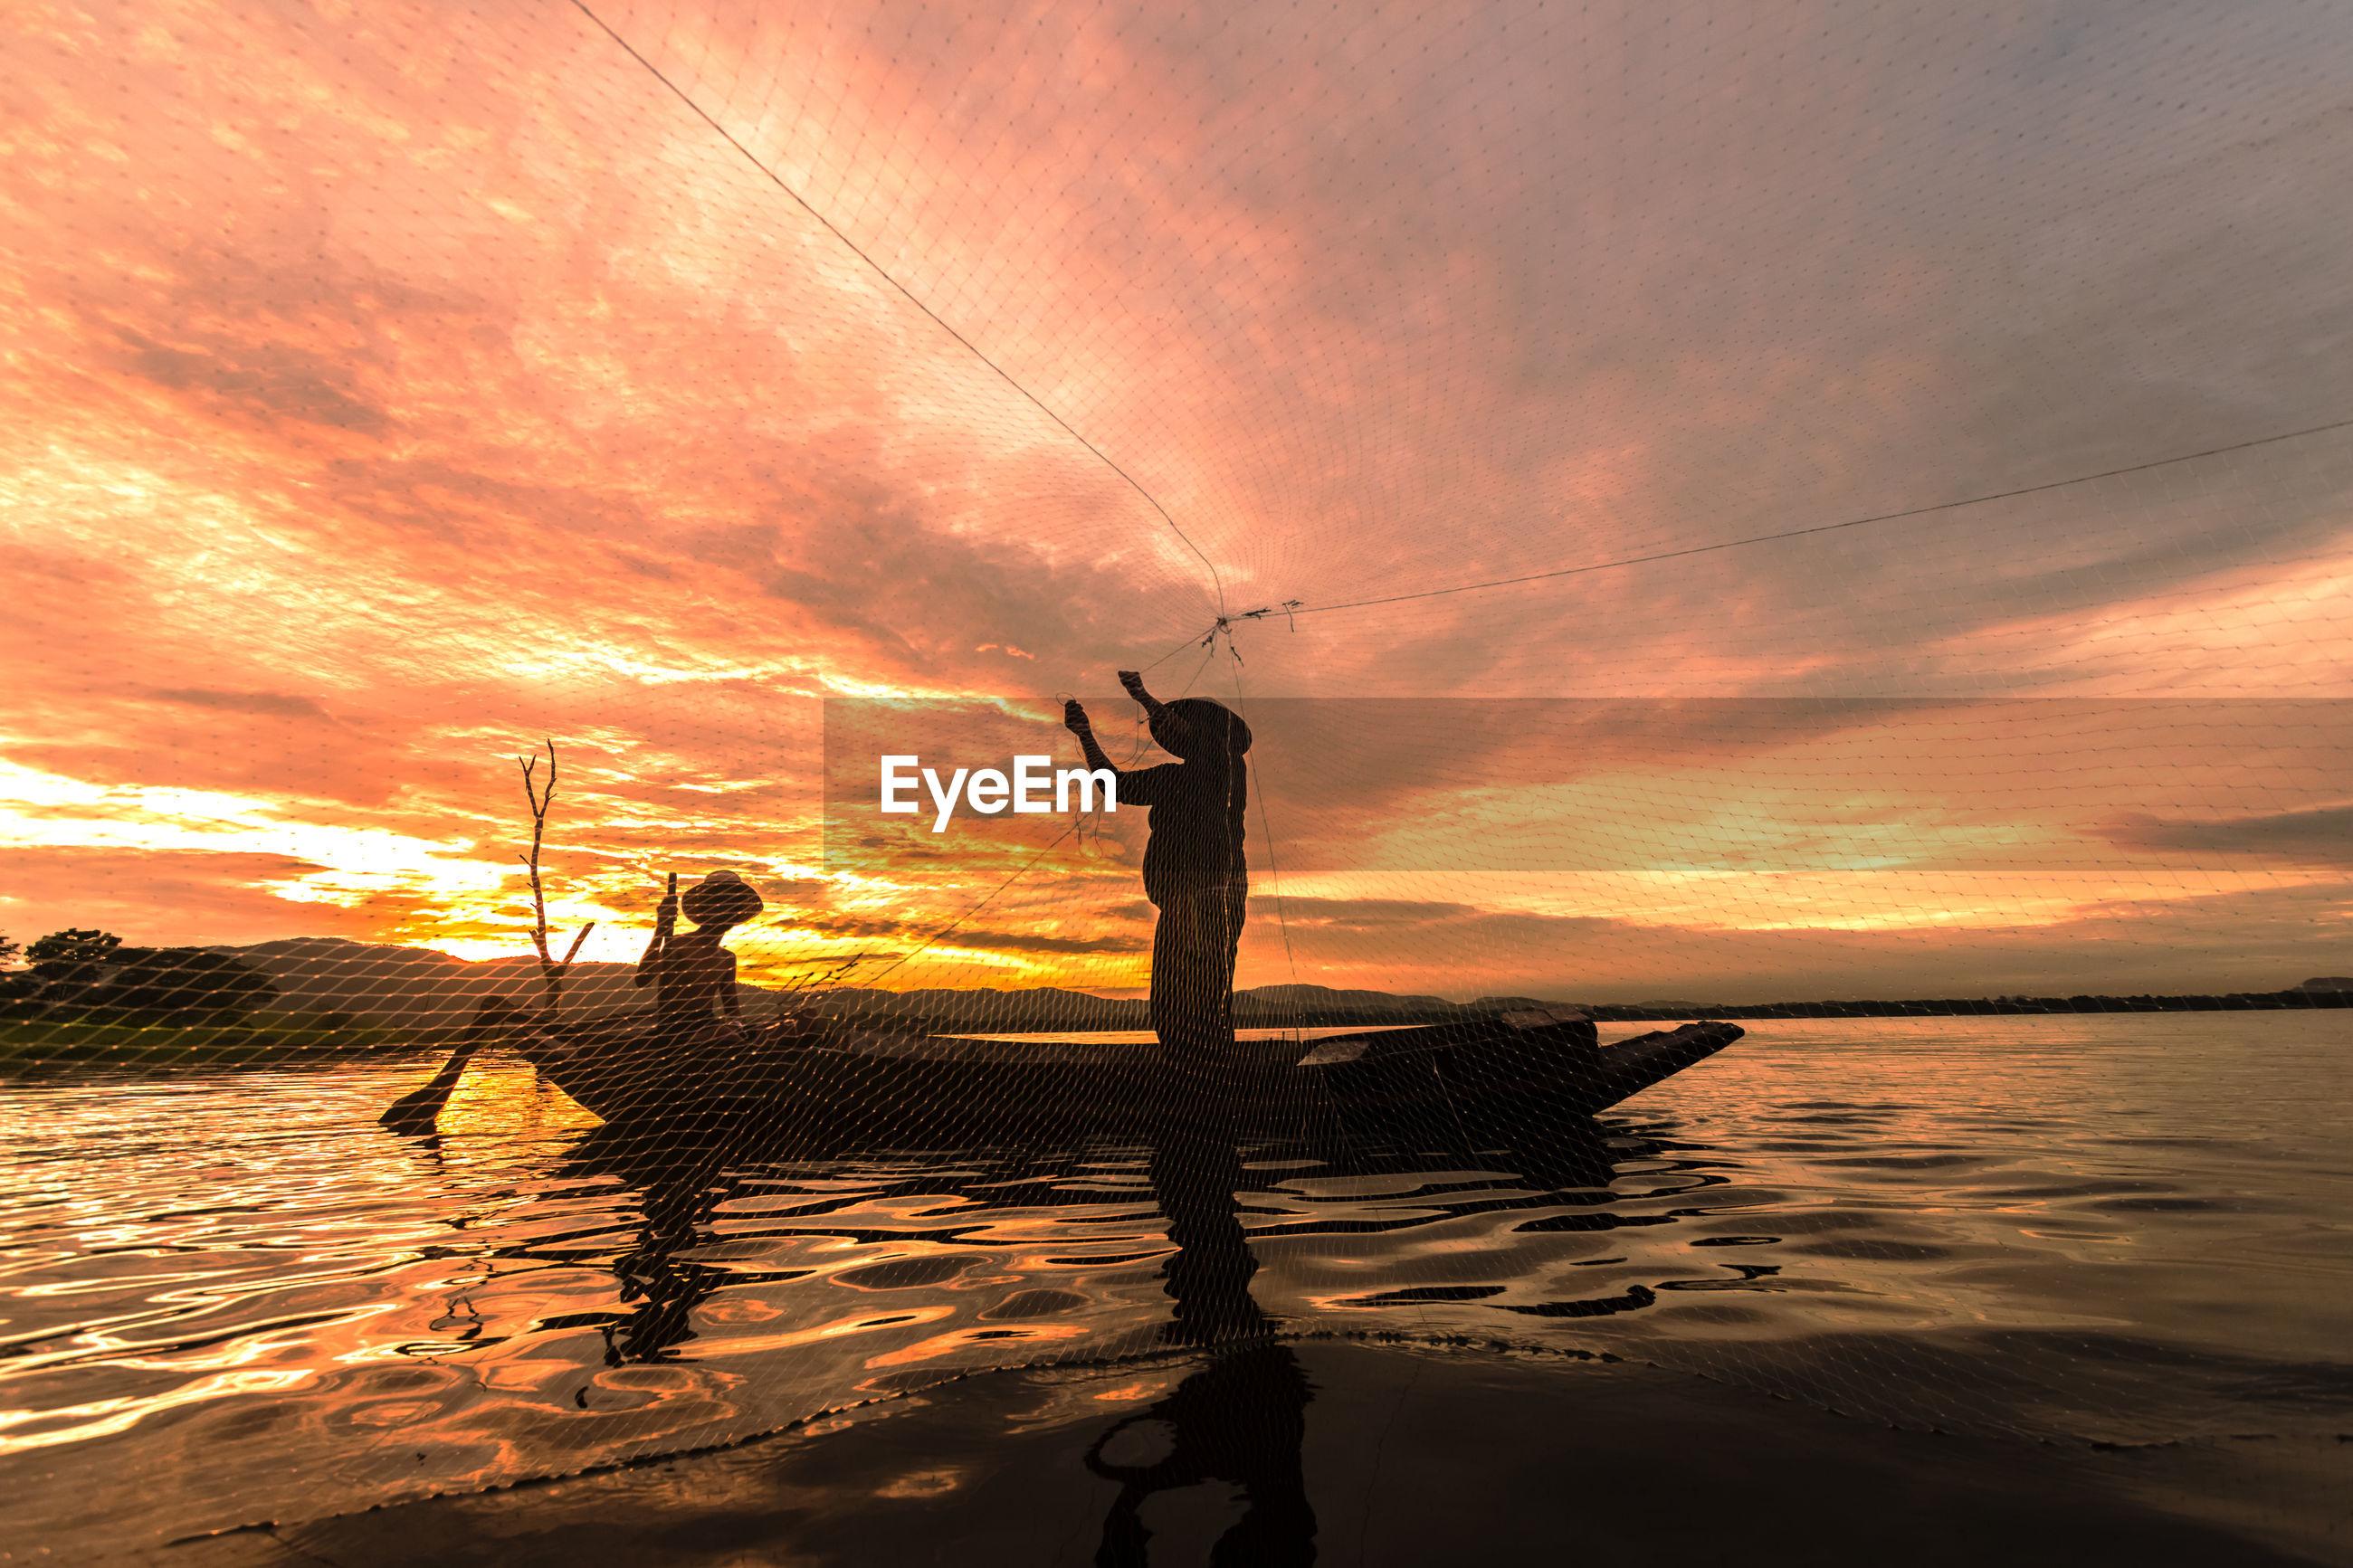 Silhouette fishermen fishing in sea against orange cloudy sky